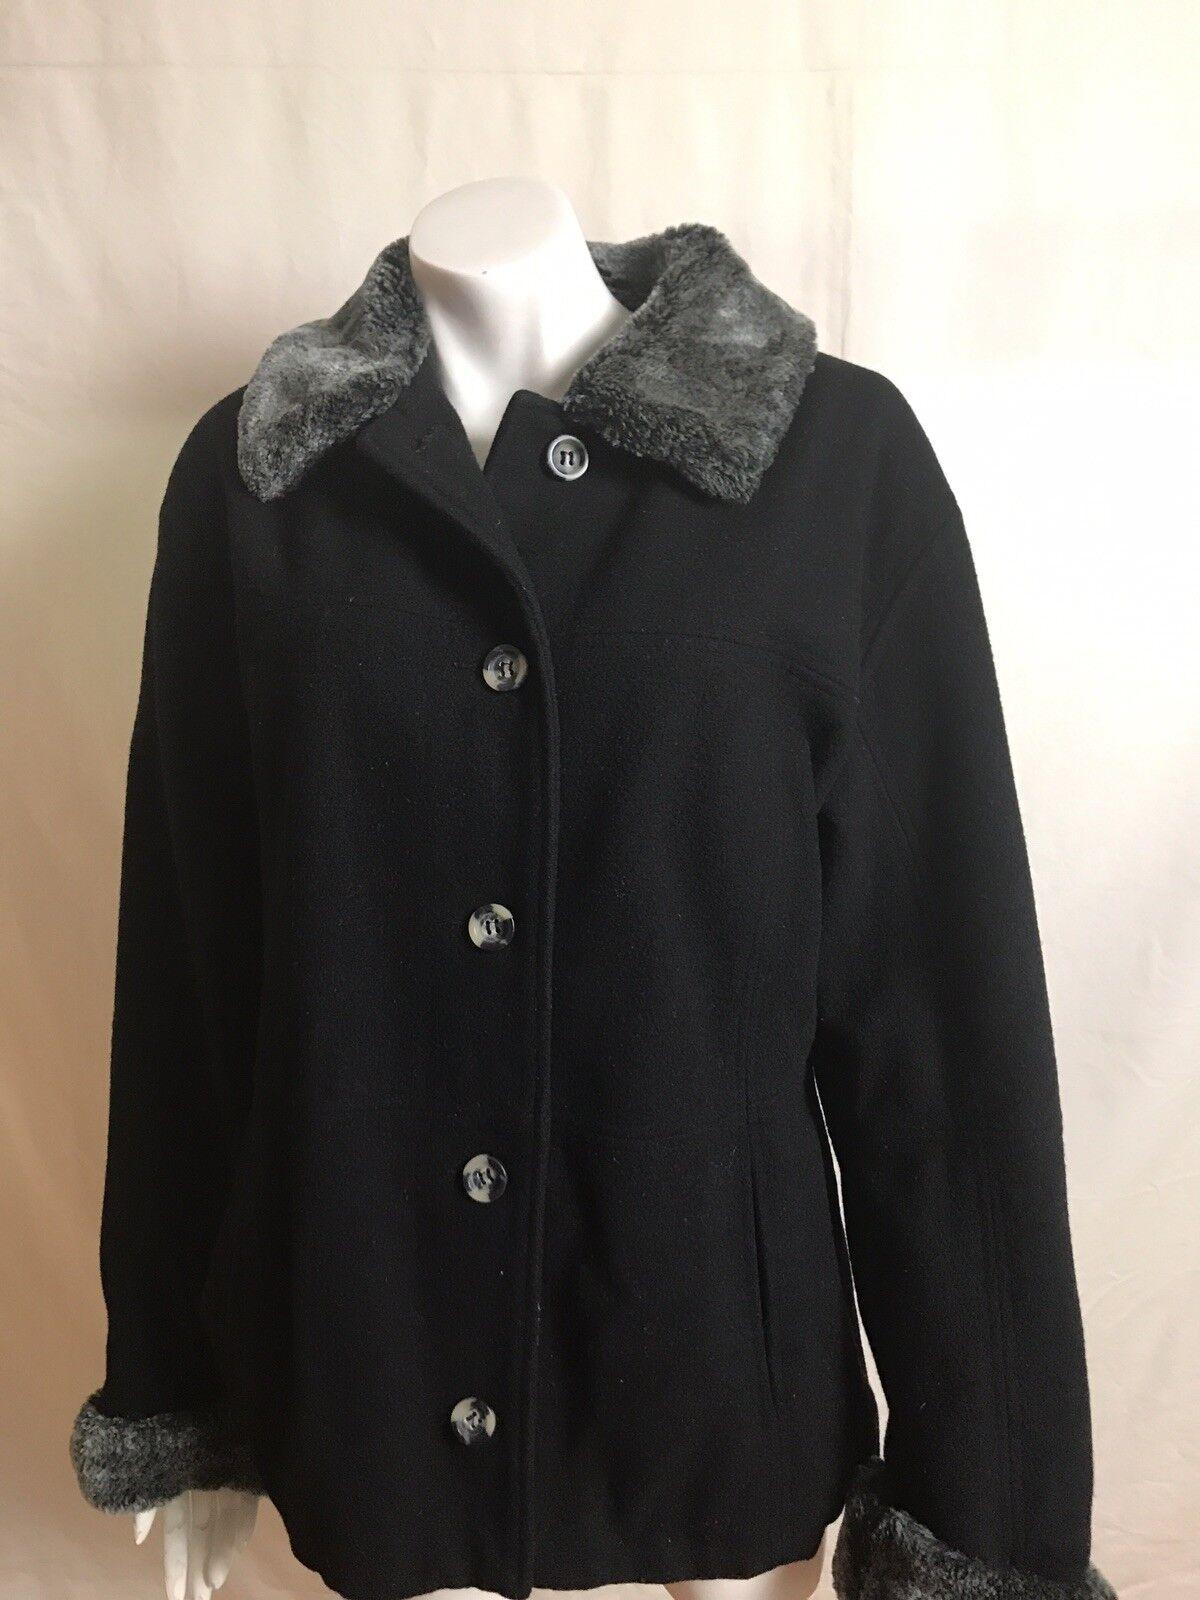 Braetan Women's Coat Size Large Jacket 90% Wool Black Gray button Up Pockets EUC